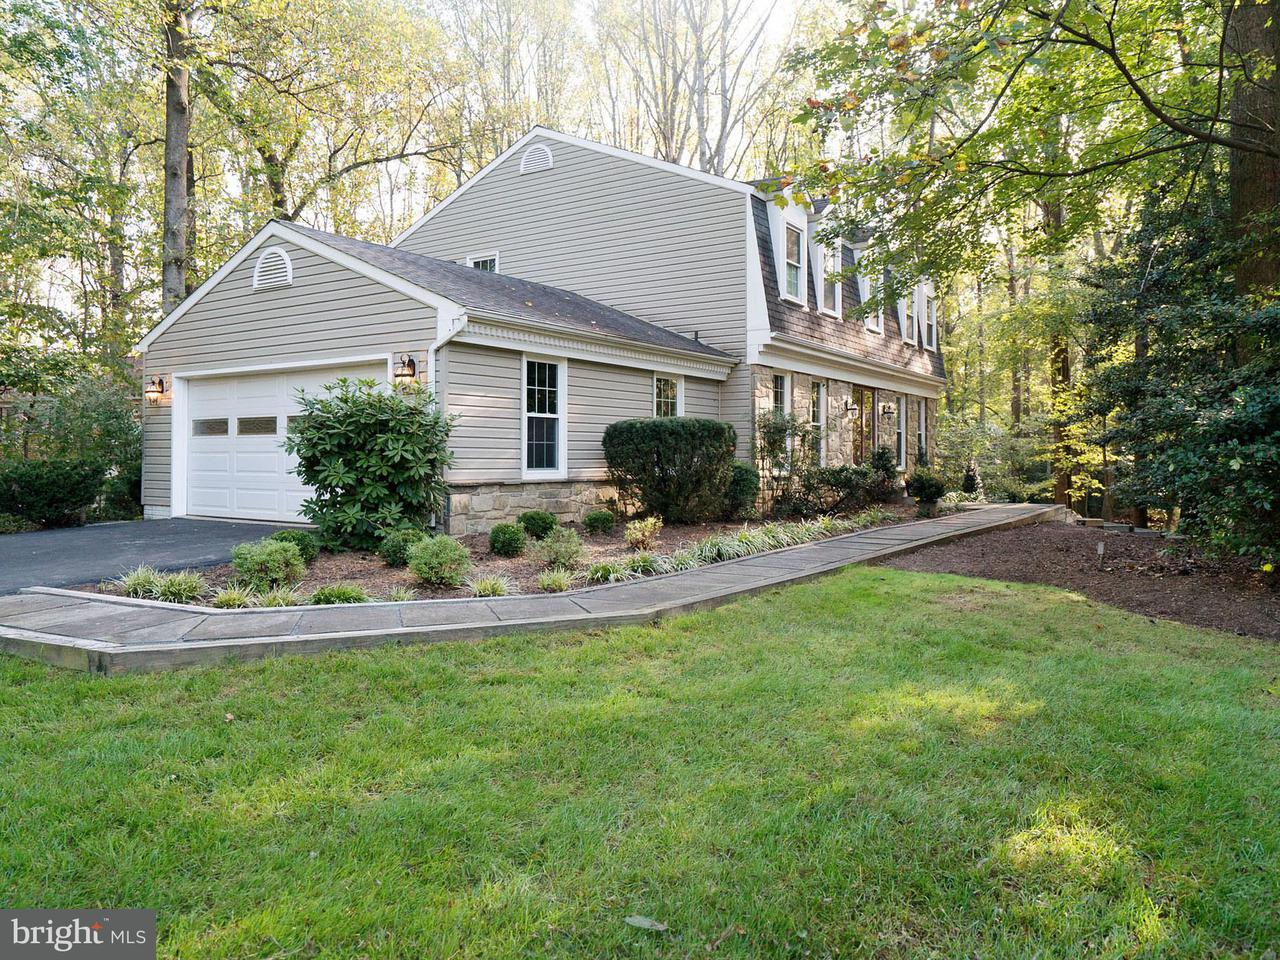 Single Family Home for Sale at 11208 Cranbrook Lane 11208 Cranbrook Lane Oakton, Virginia 22124 United States